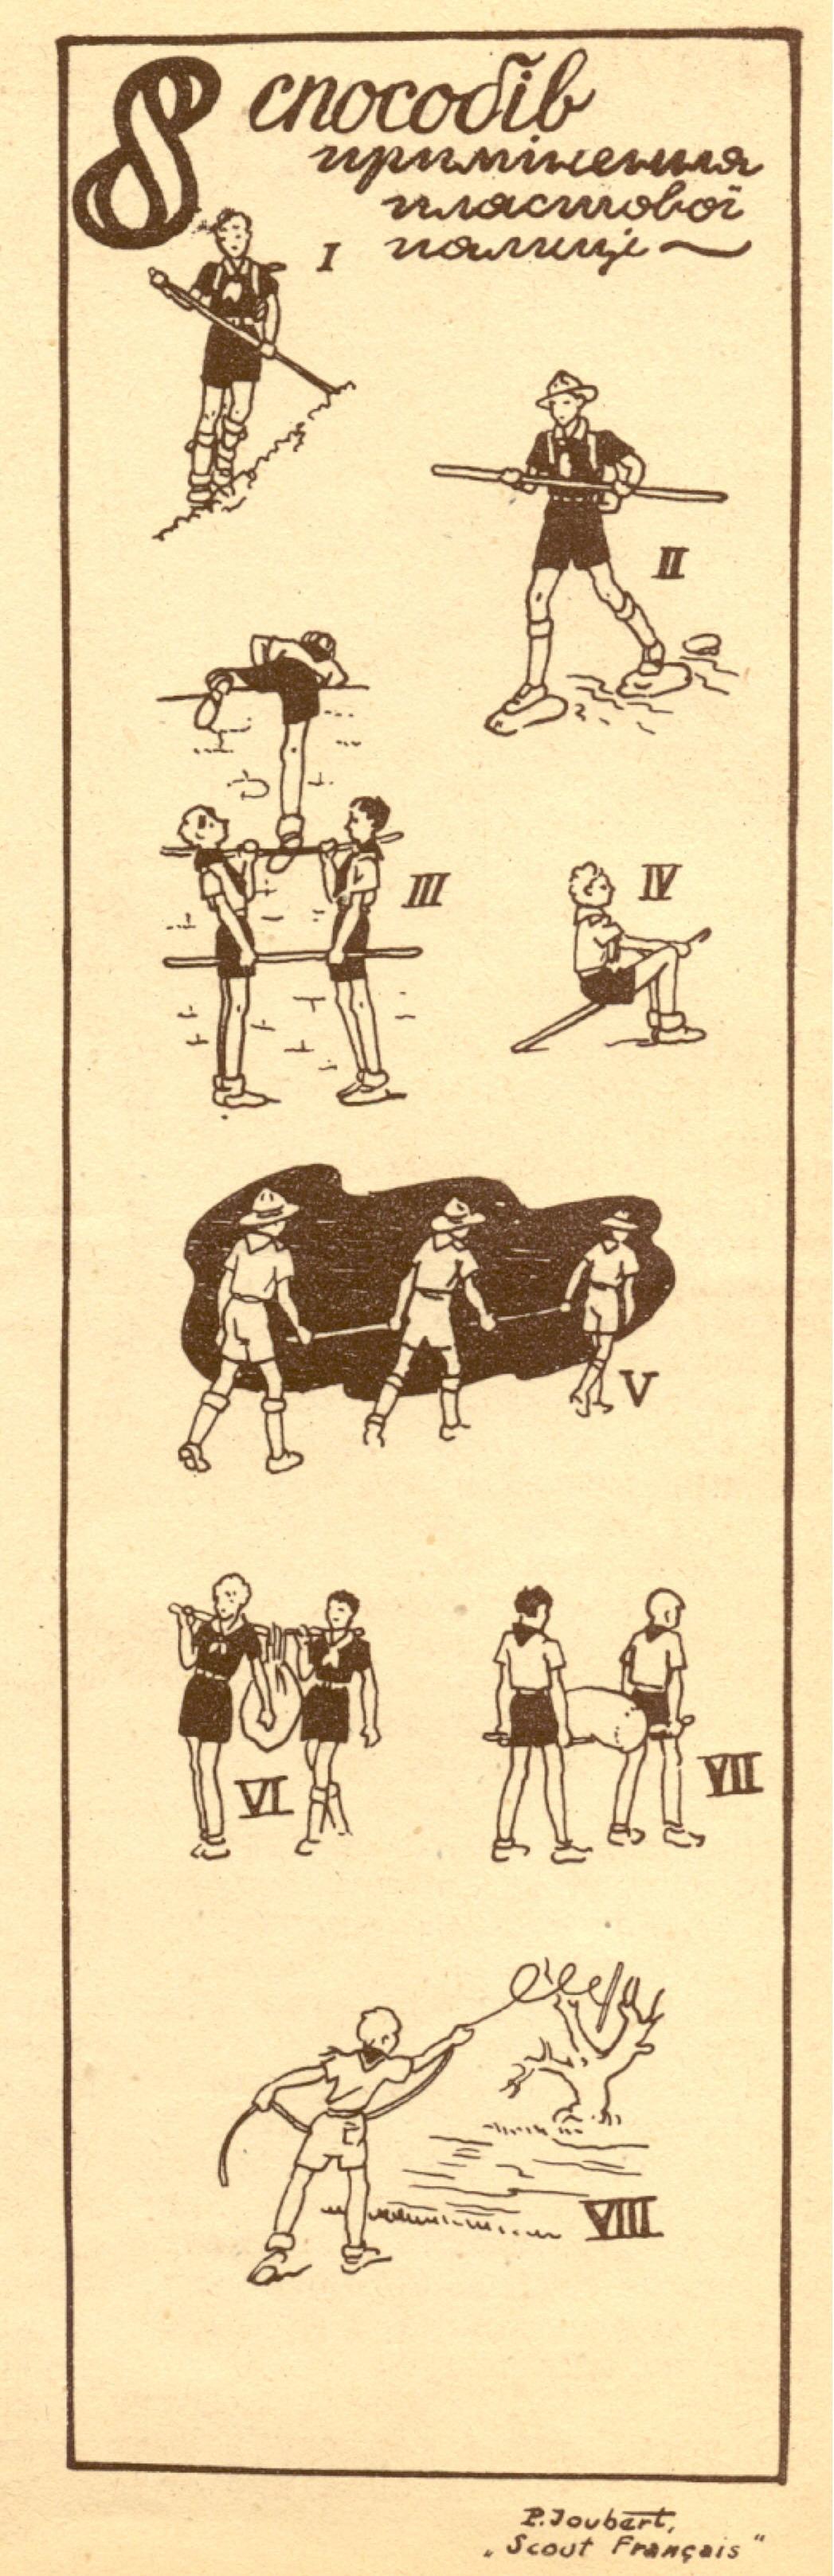 1946. Пластовий однострій. Пластун скаут ч.3 С.14